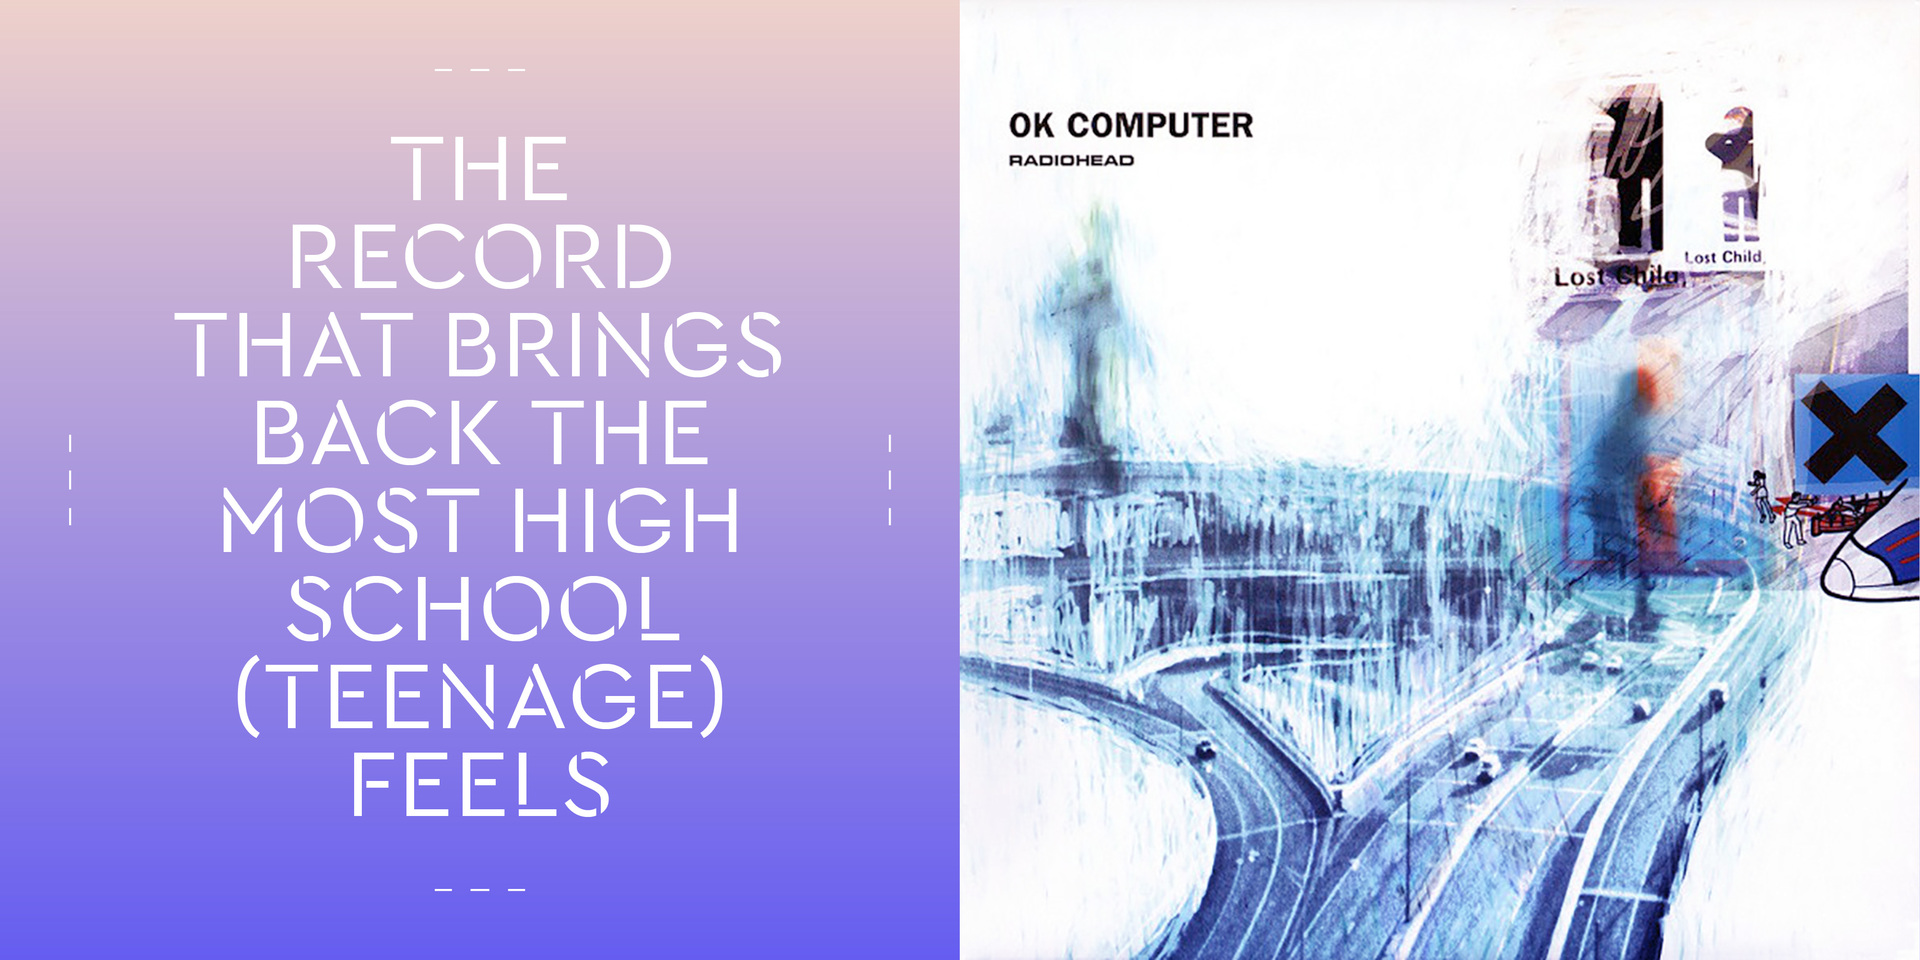 radiohead ok computer thom yorke jonny greenwood